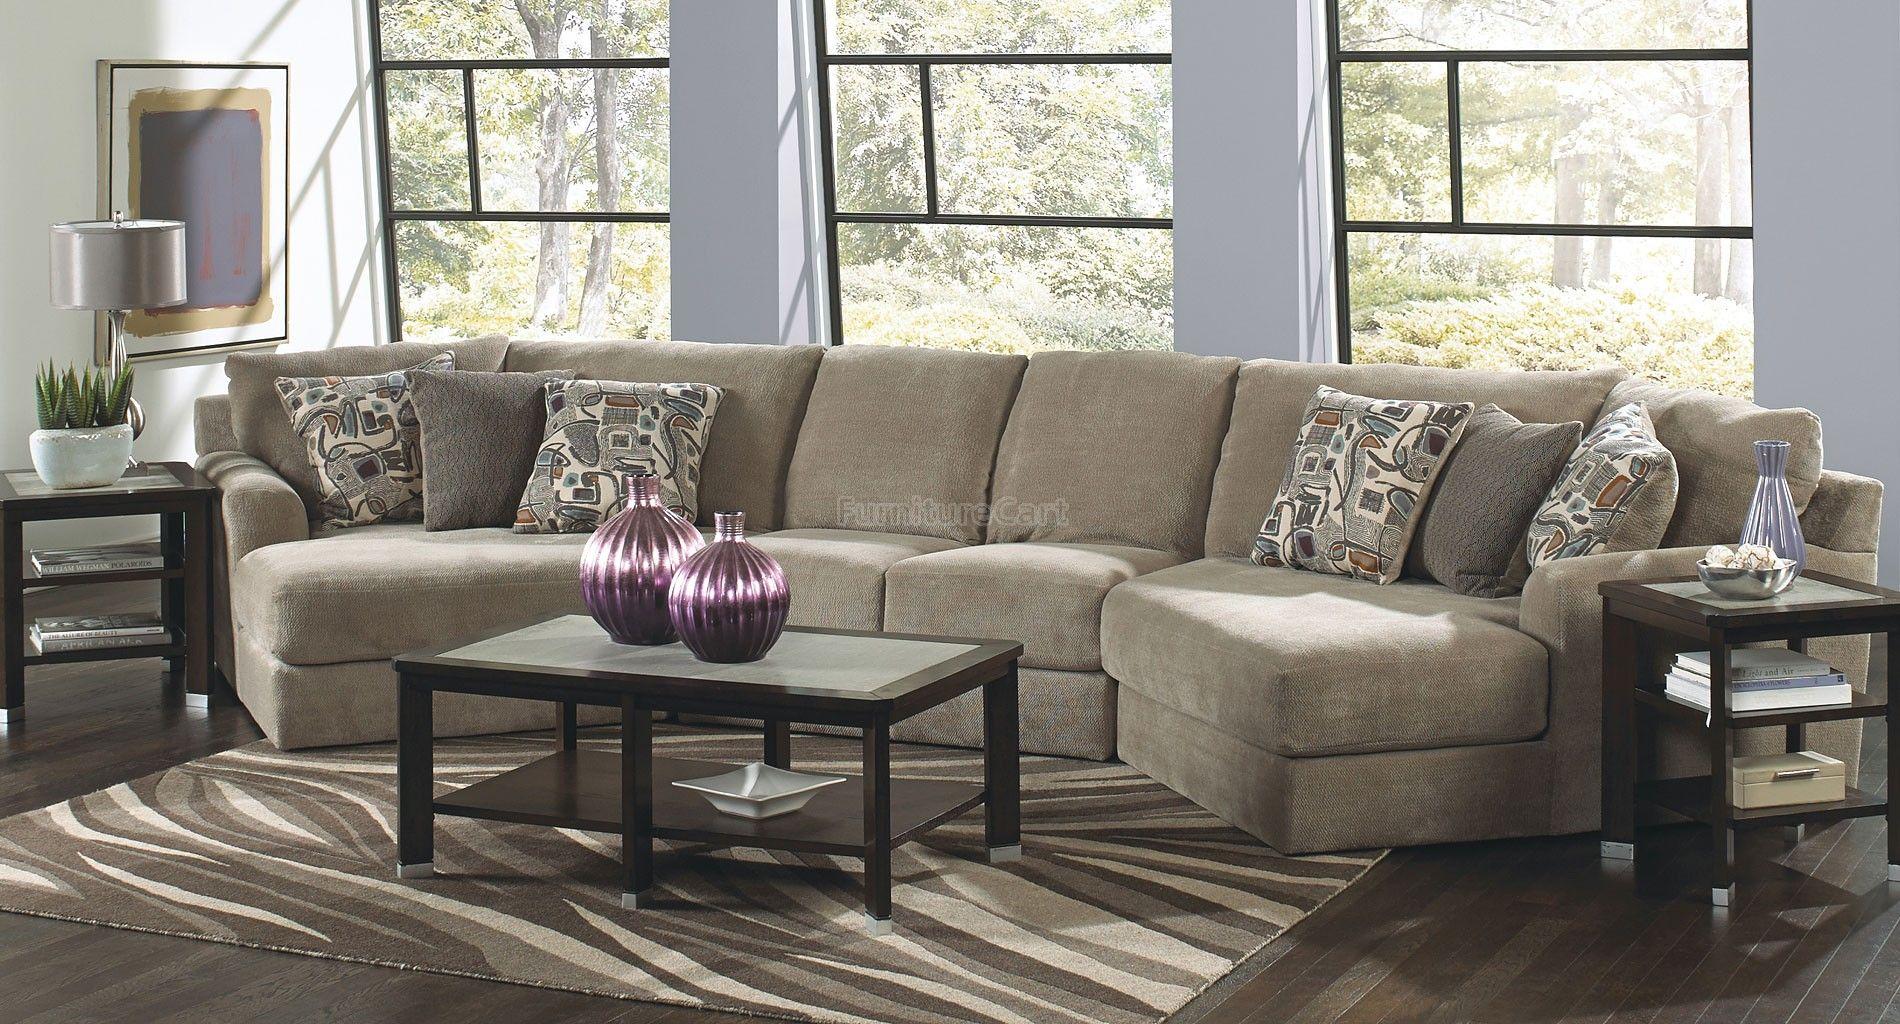 Malibu Modular Sectional W Piano Wedge Taupe Stylish Living Room Furniture Jackson Furniture Furniture